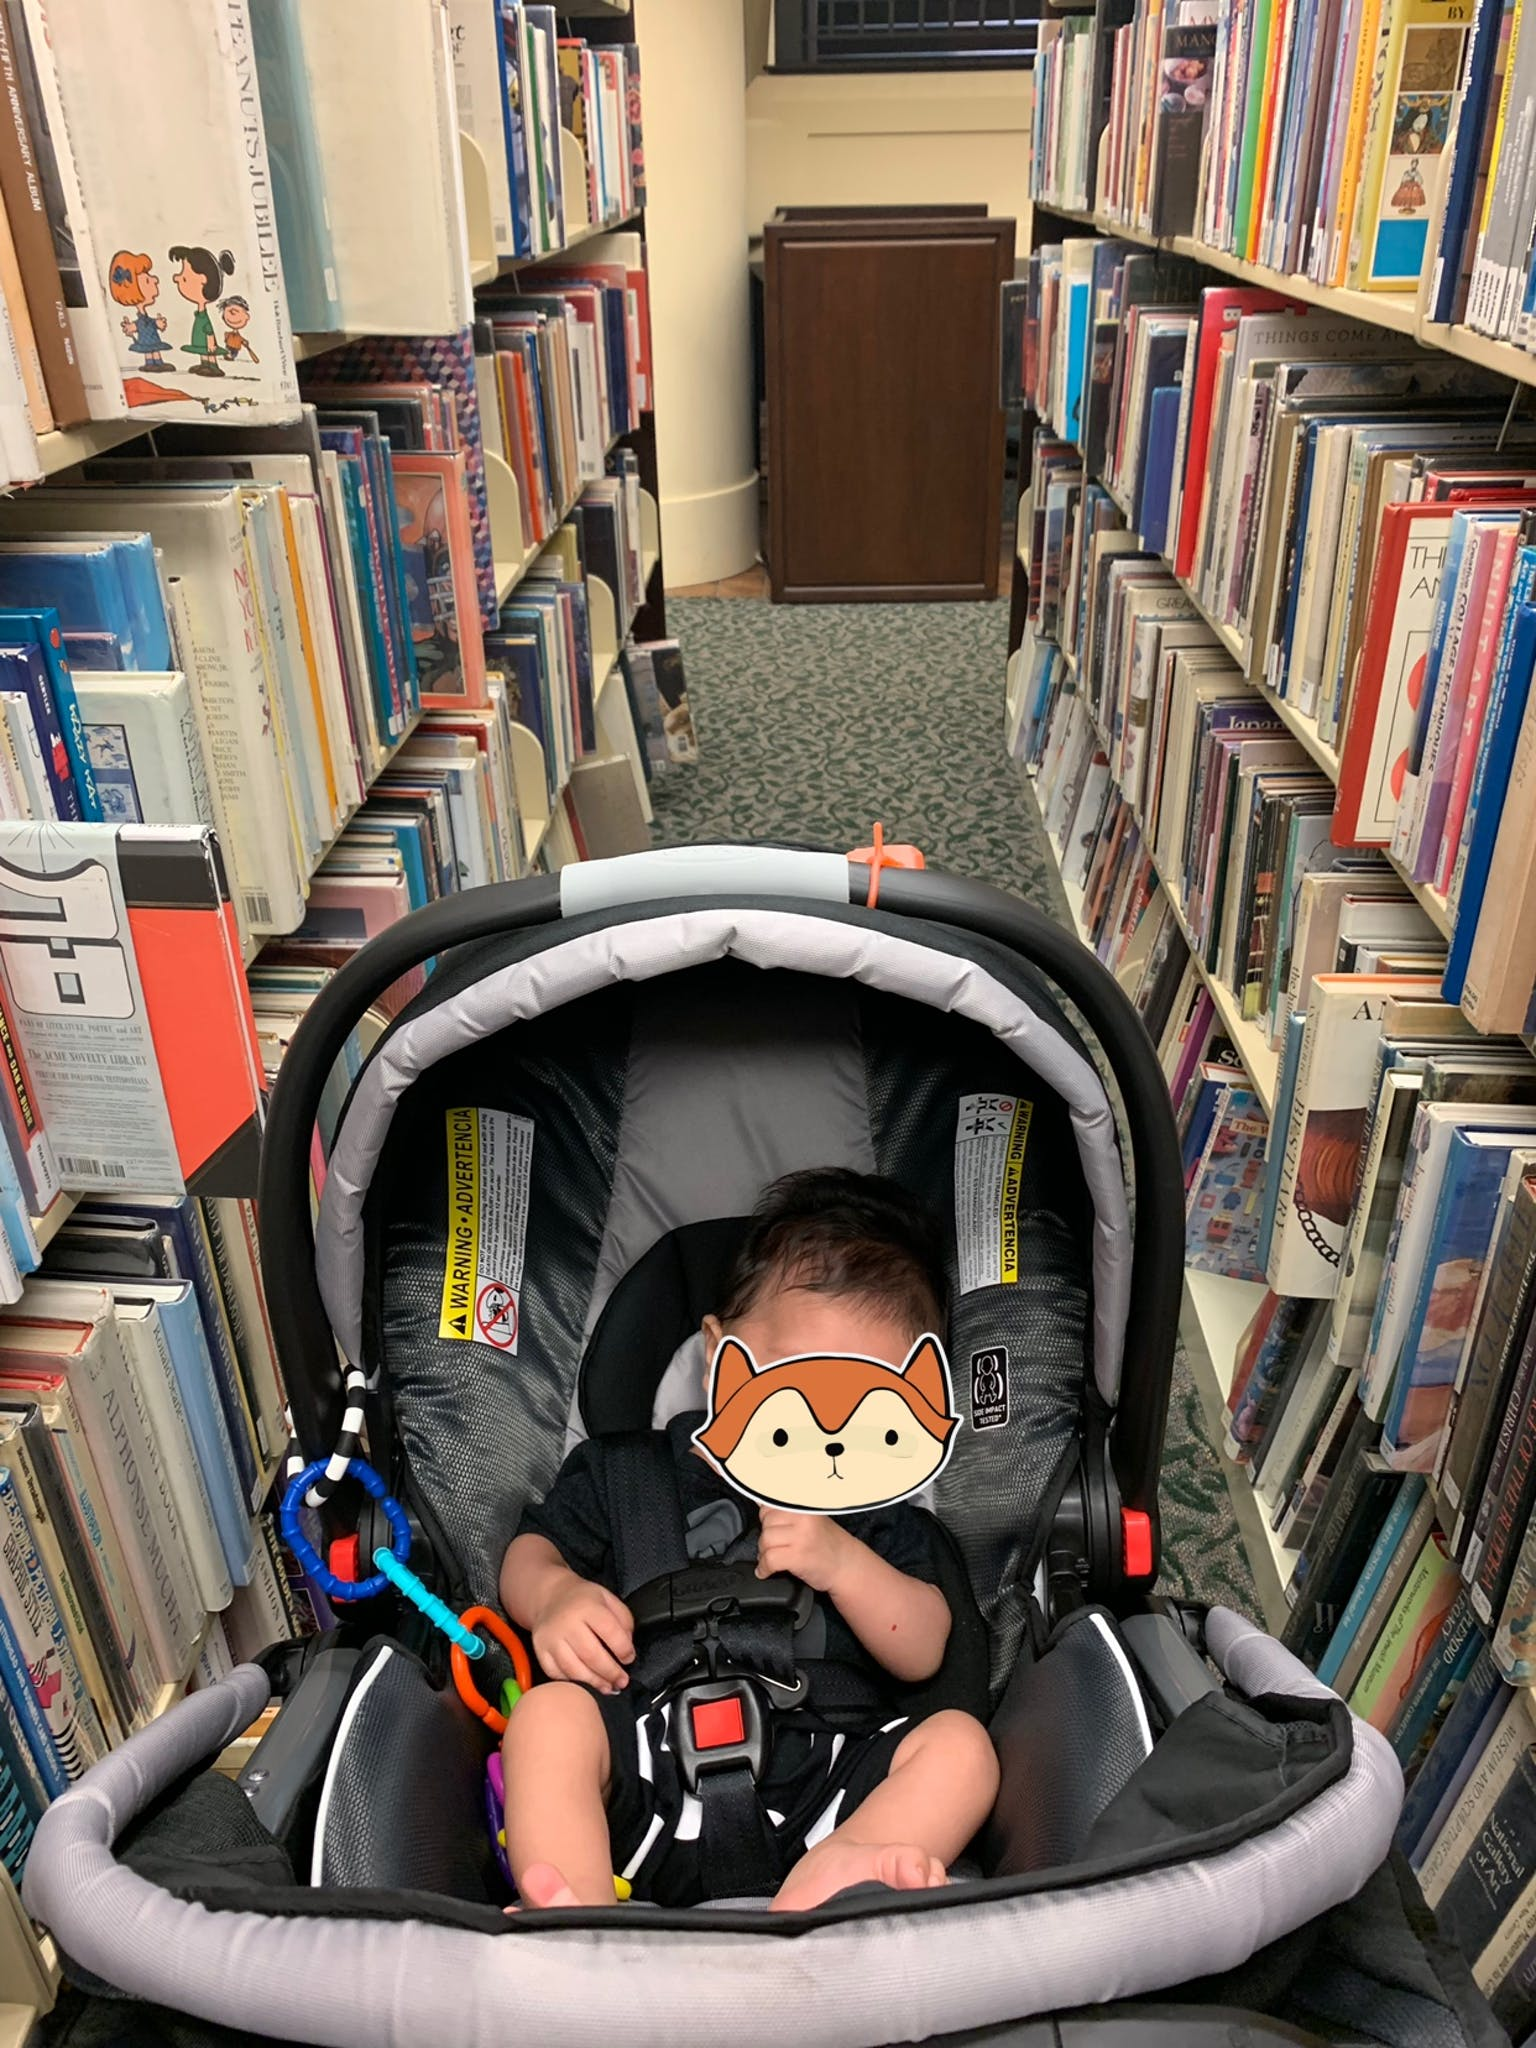 Burlingame Public Library in Burlingame, CA